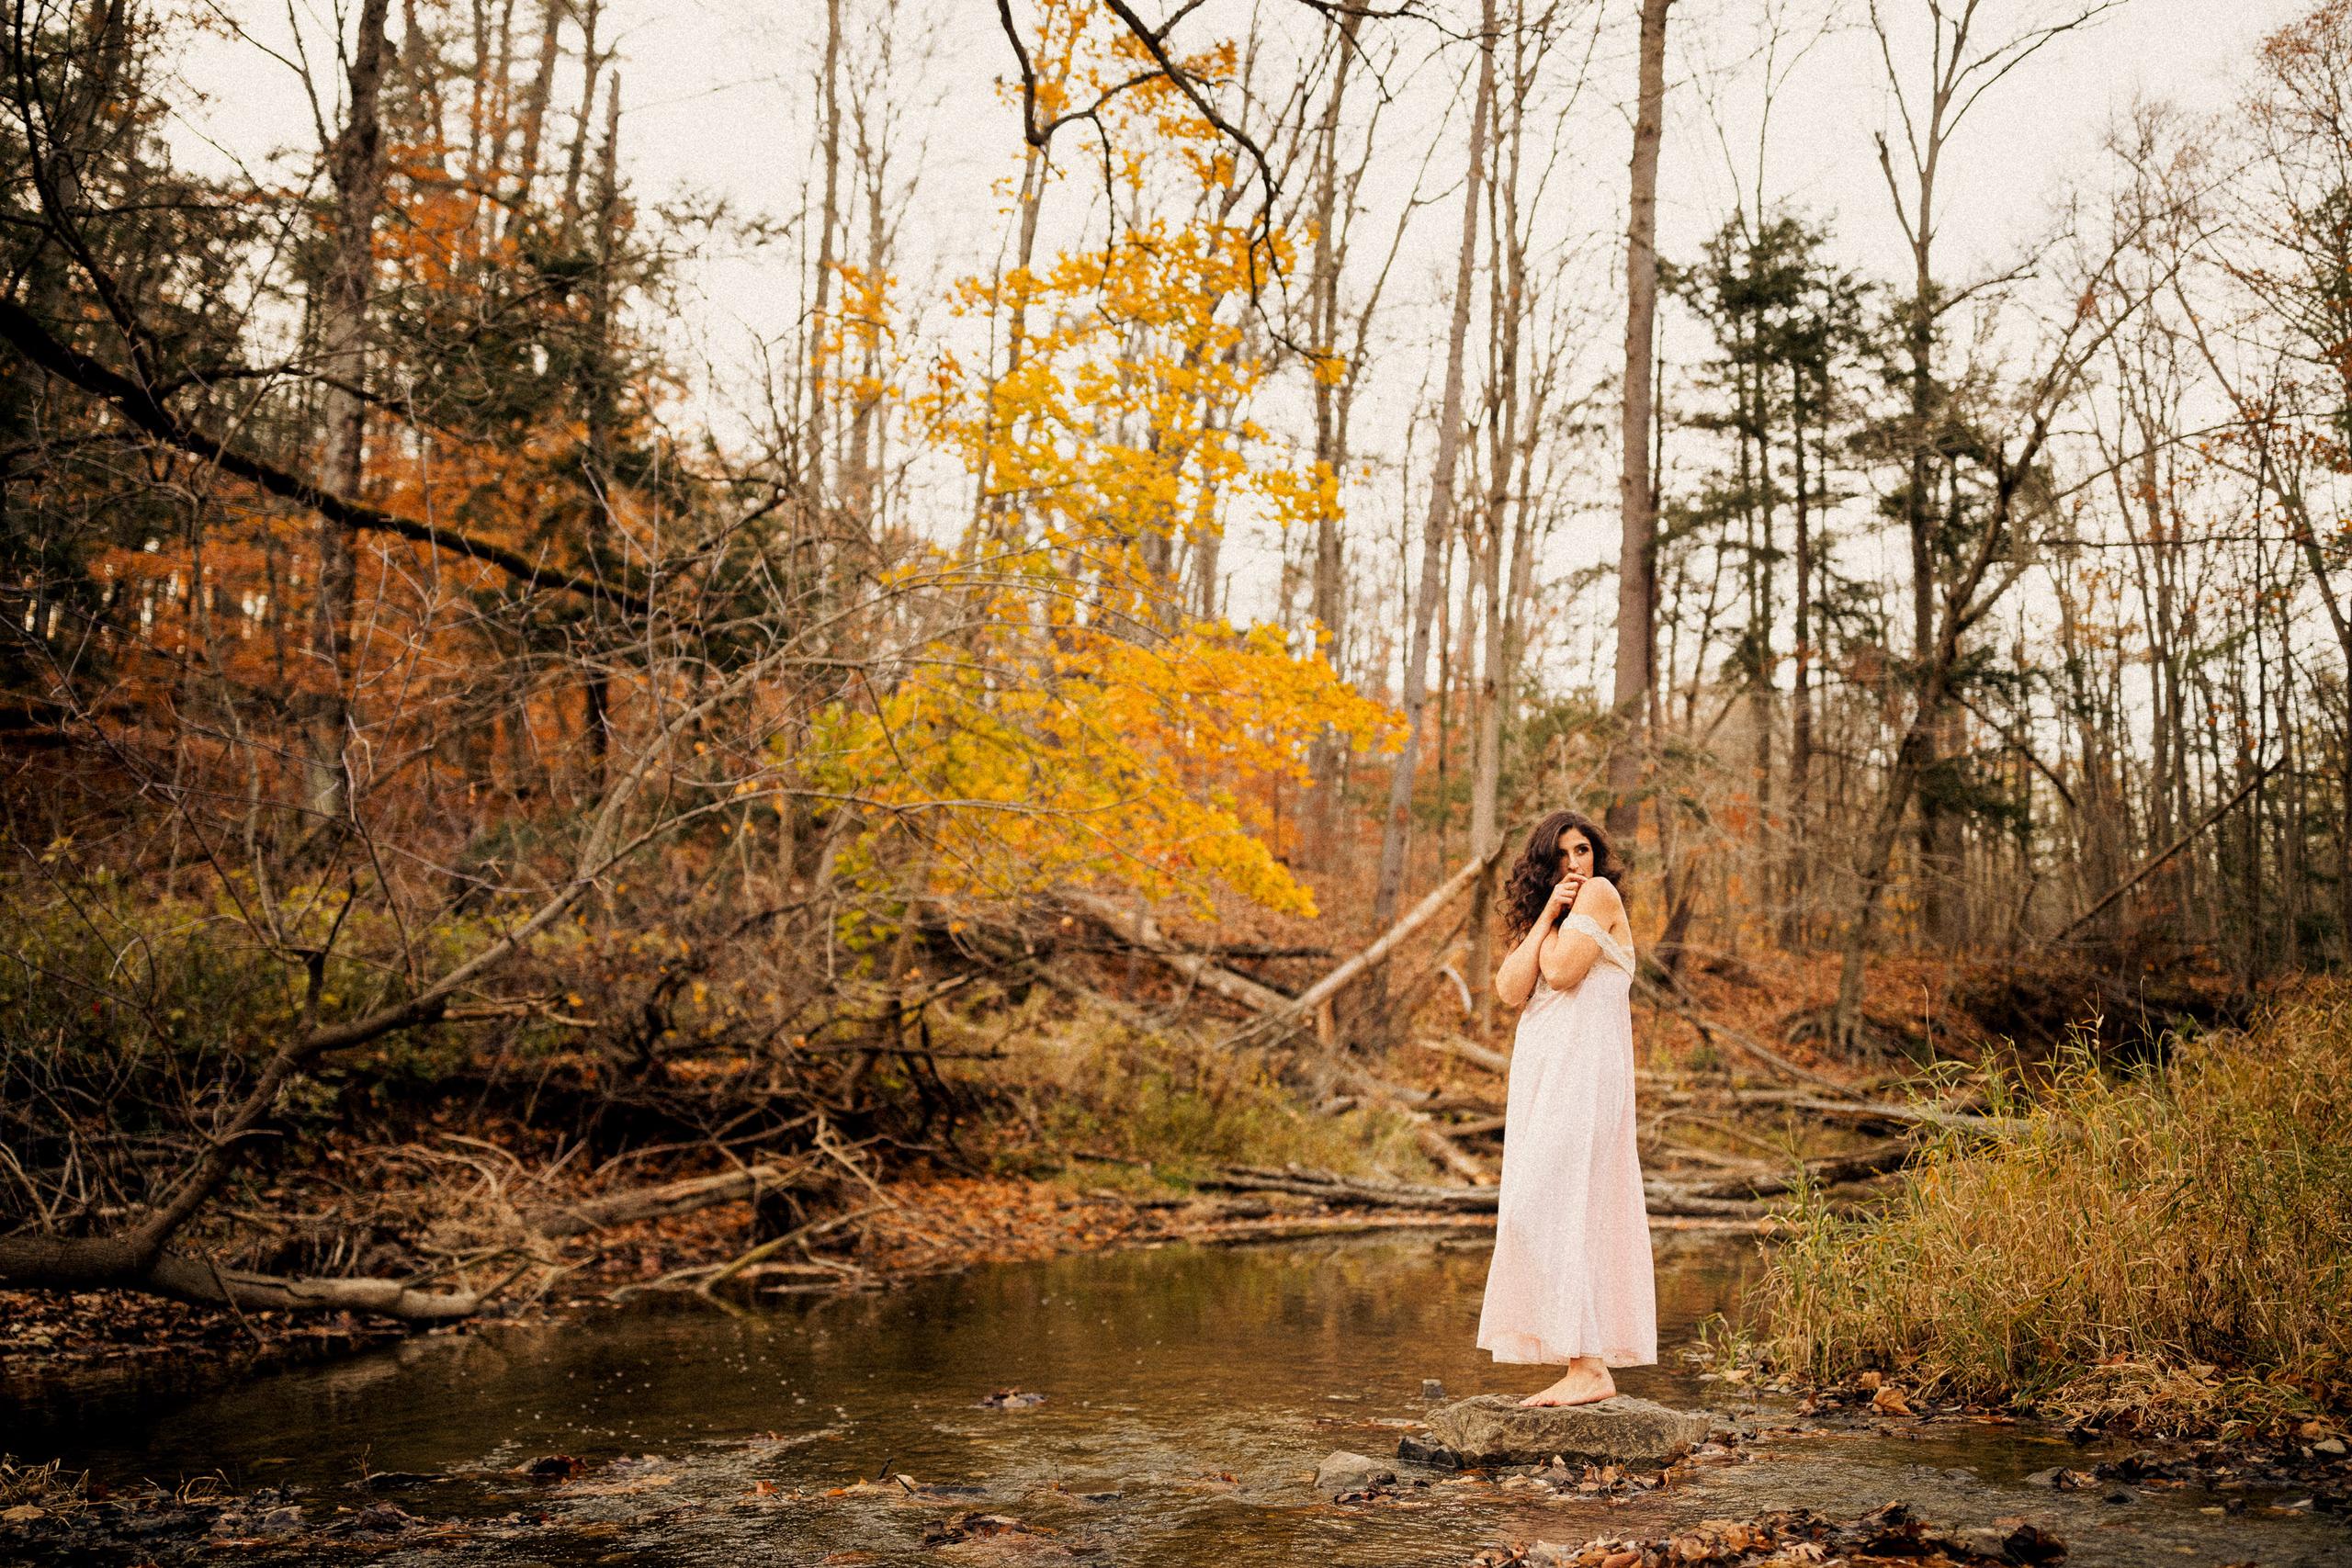 outdoor boudoir river fall autumn pink girl water